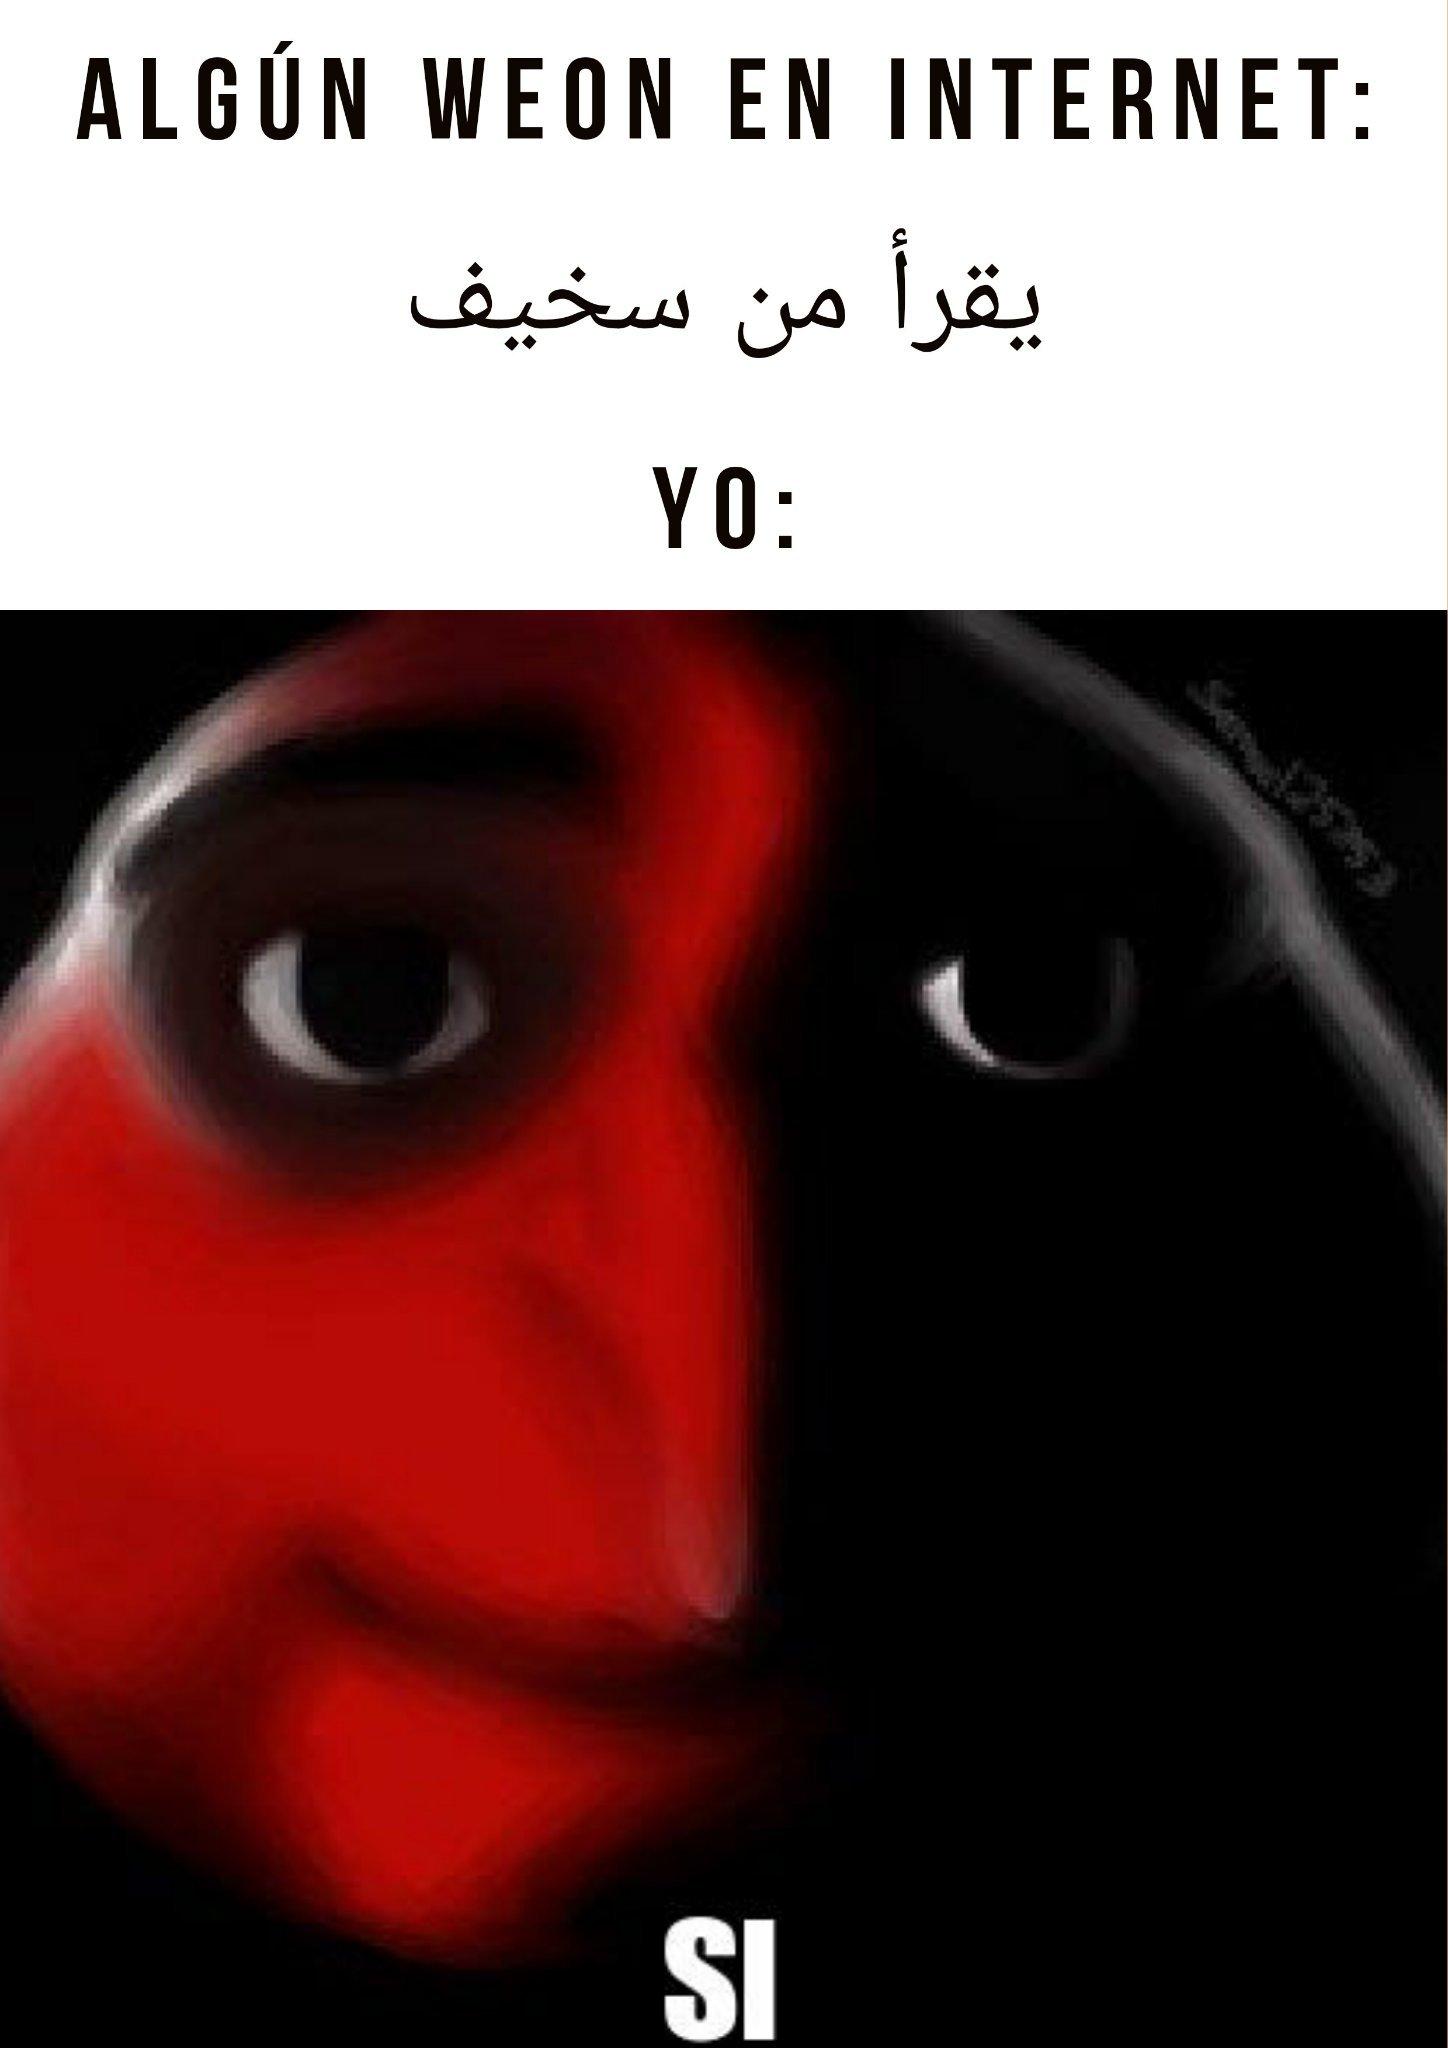 Si - meme